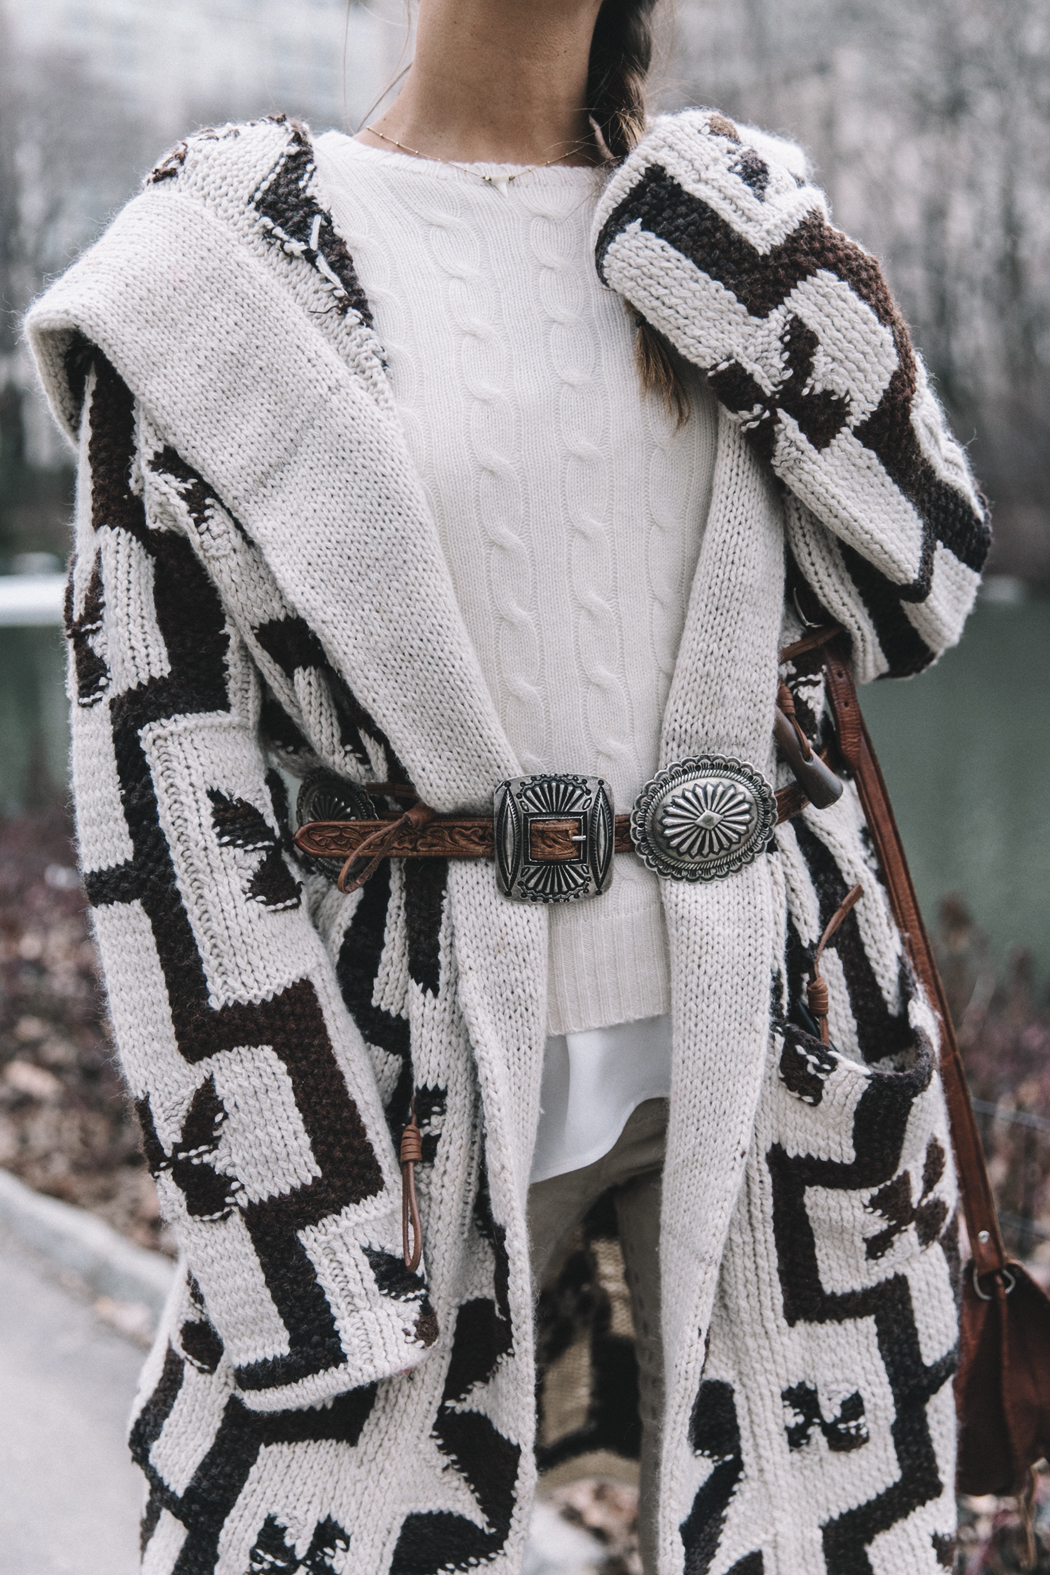 Polo_Ralph_Lauren_Collage_Vintage-Street_Style-NYFW-New_York_Fashion_Week-Knit_Jacket-Cream_Trousers-Boho-Winter_White-24